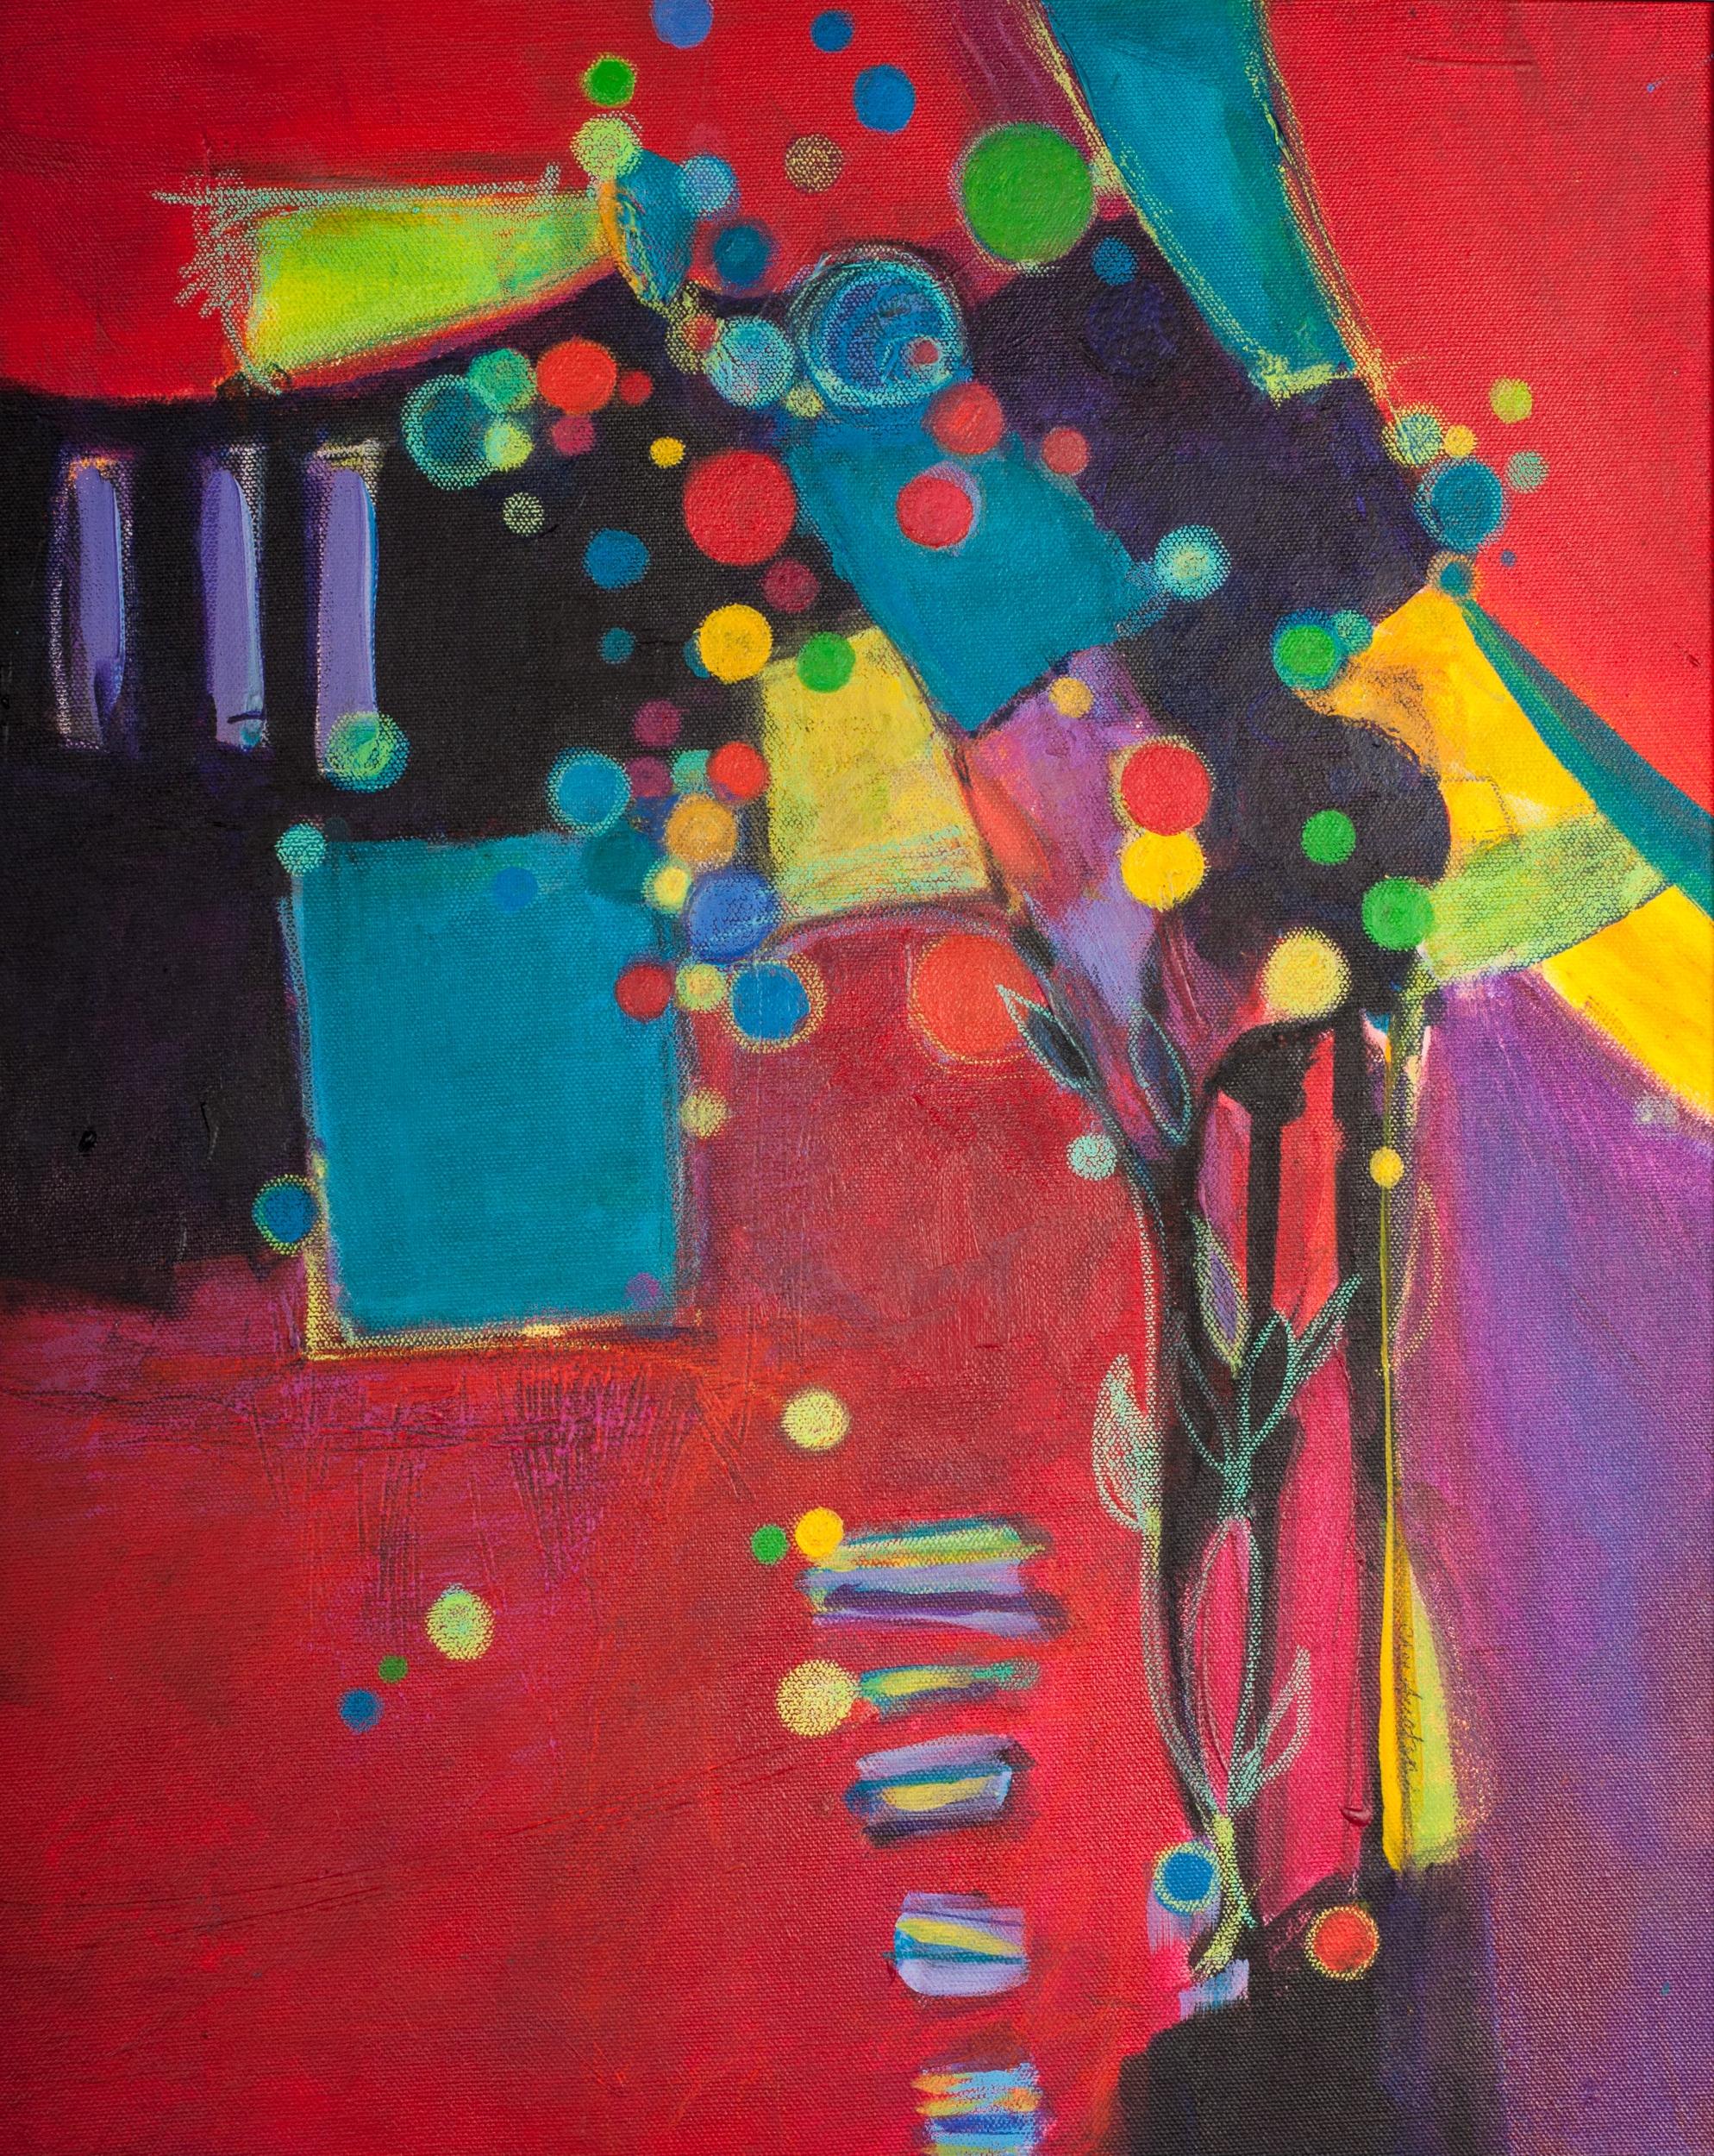 cher-austin-abstract-001.jpg